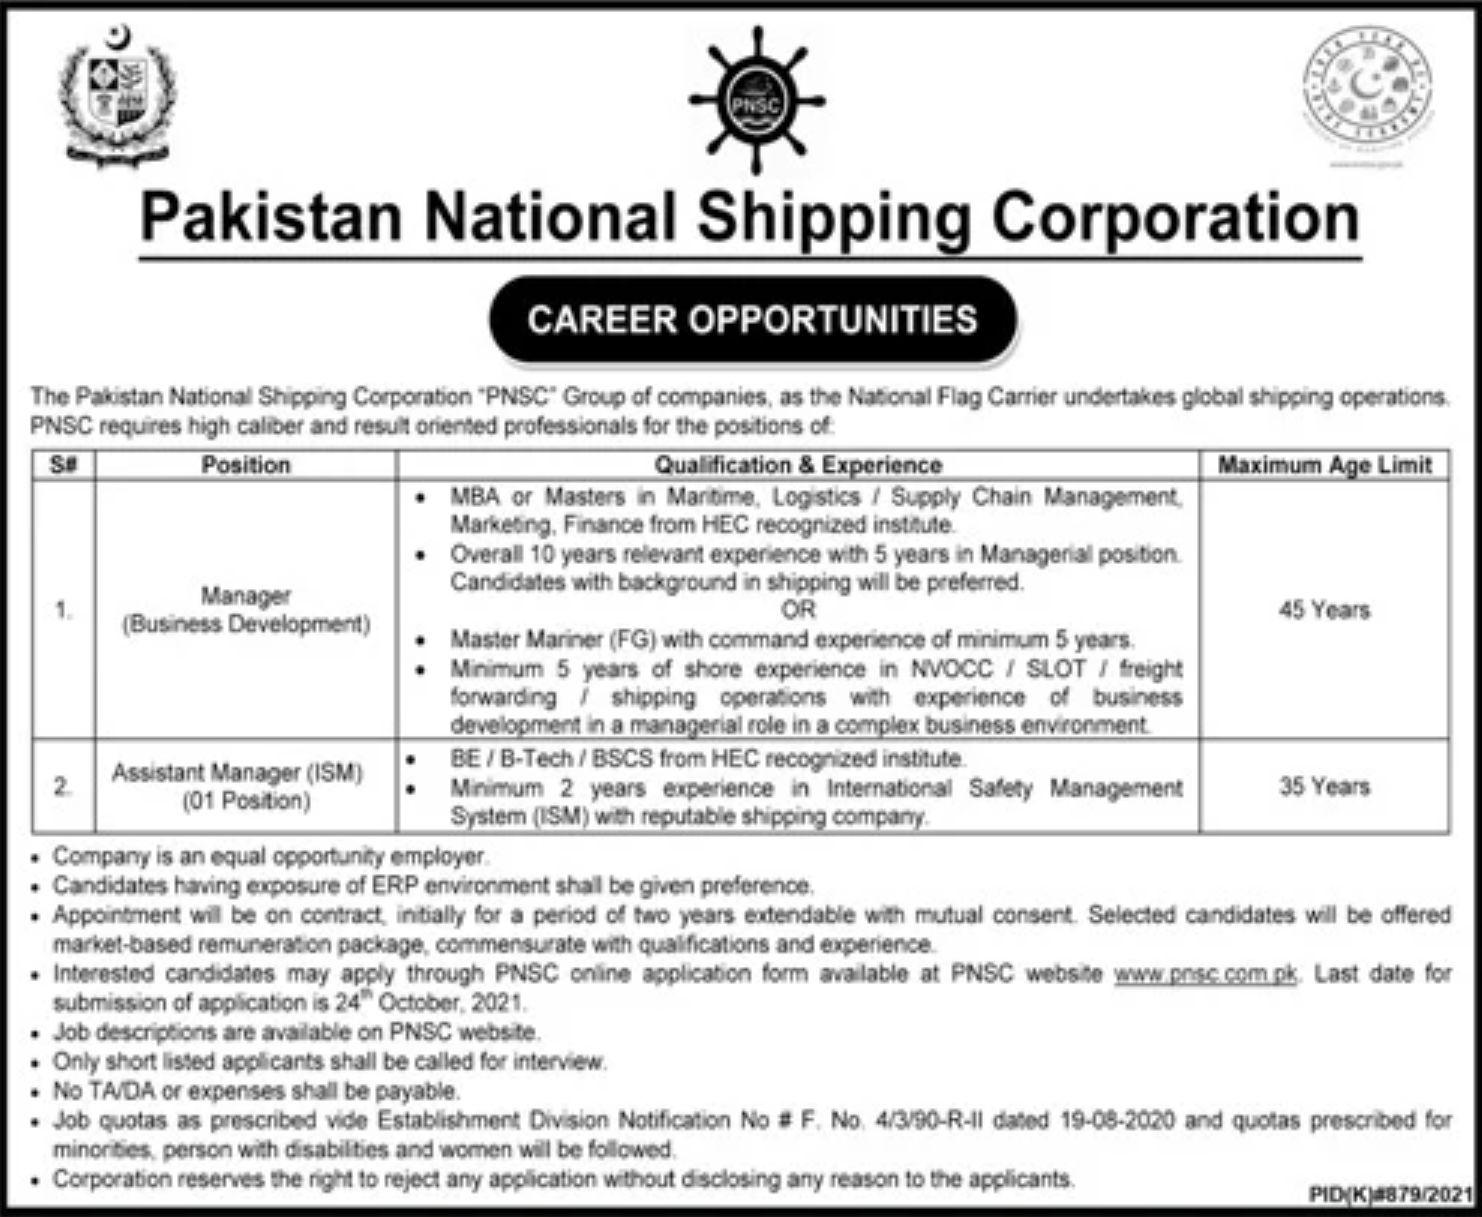 Pakistan National Shipping Corporation Vacancies 2021 – Latest Jobs 3